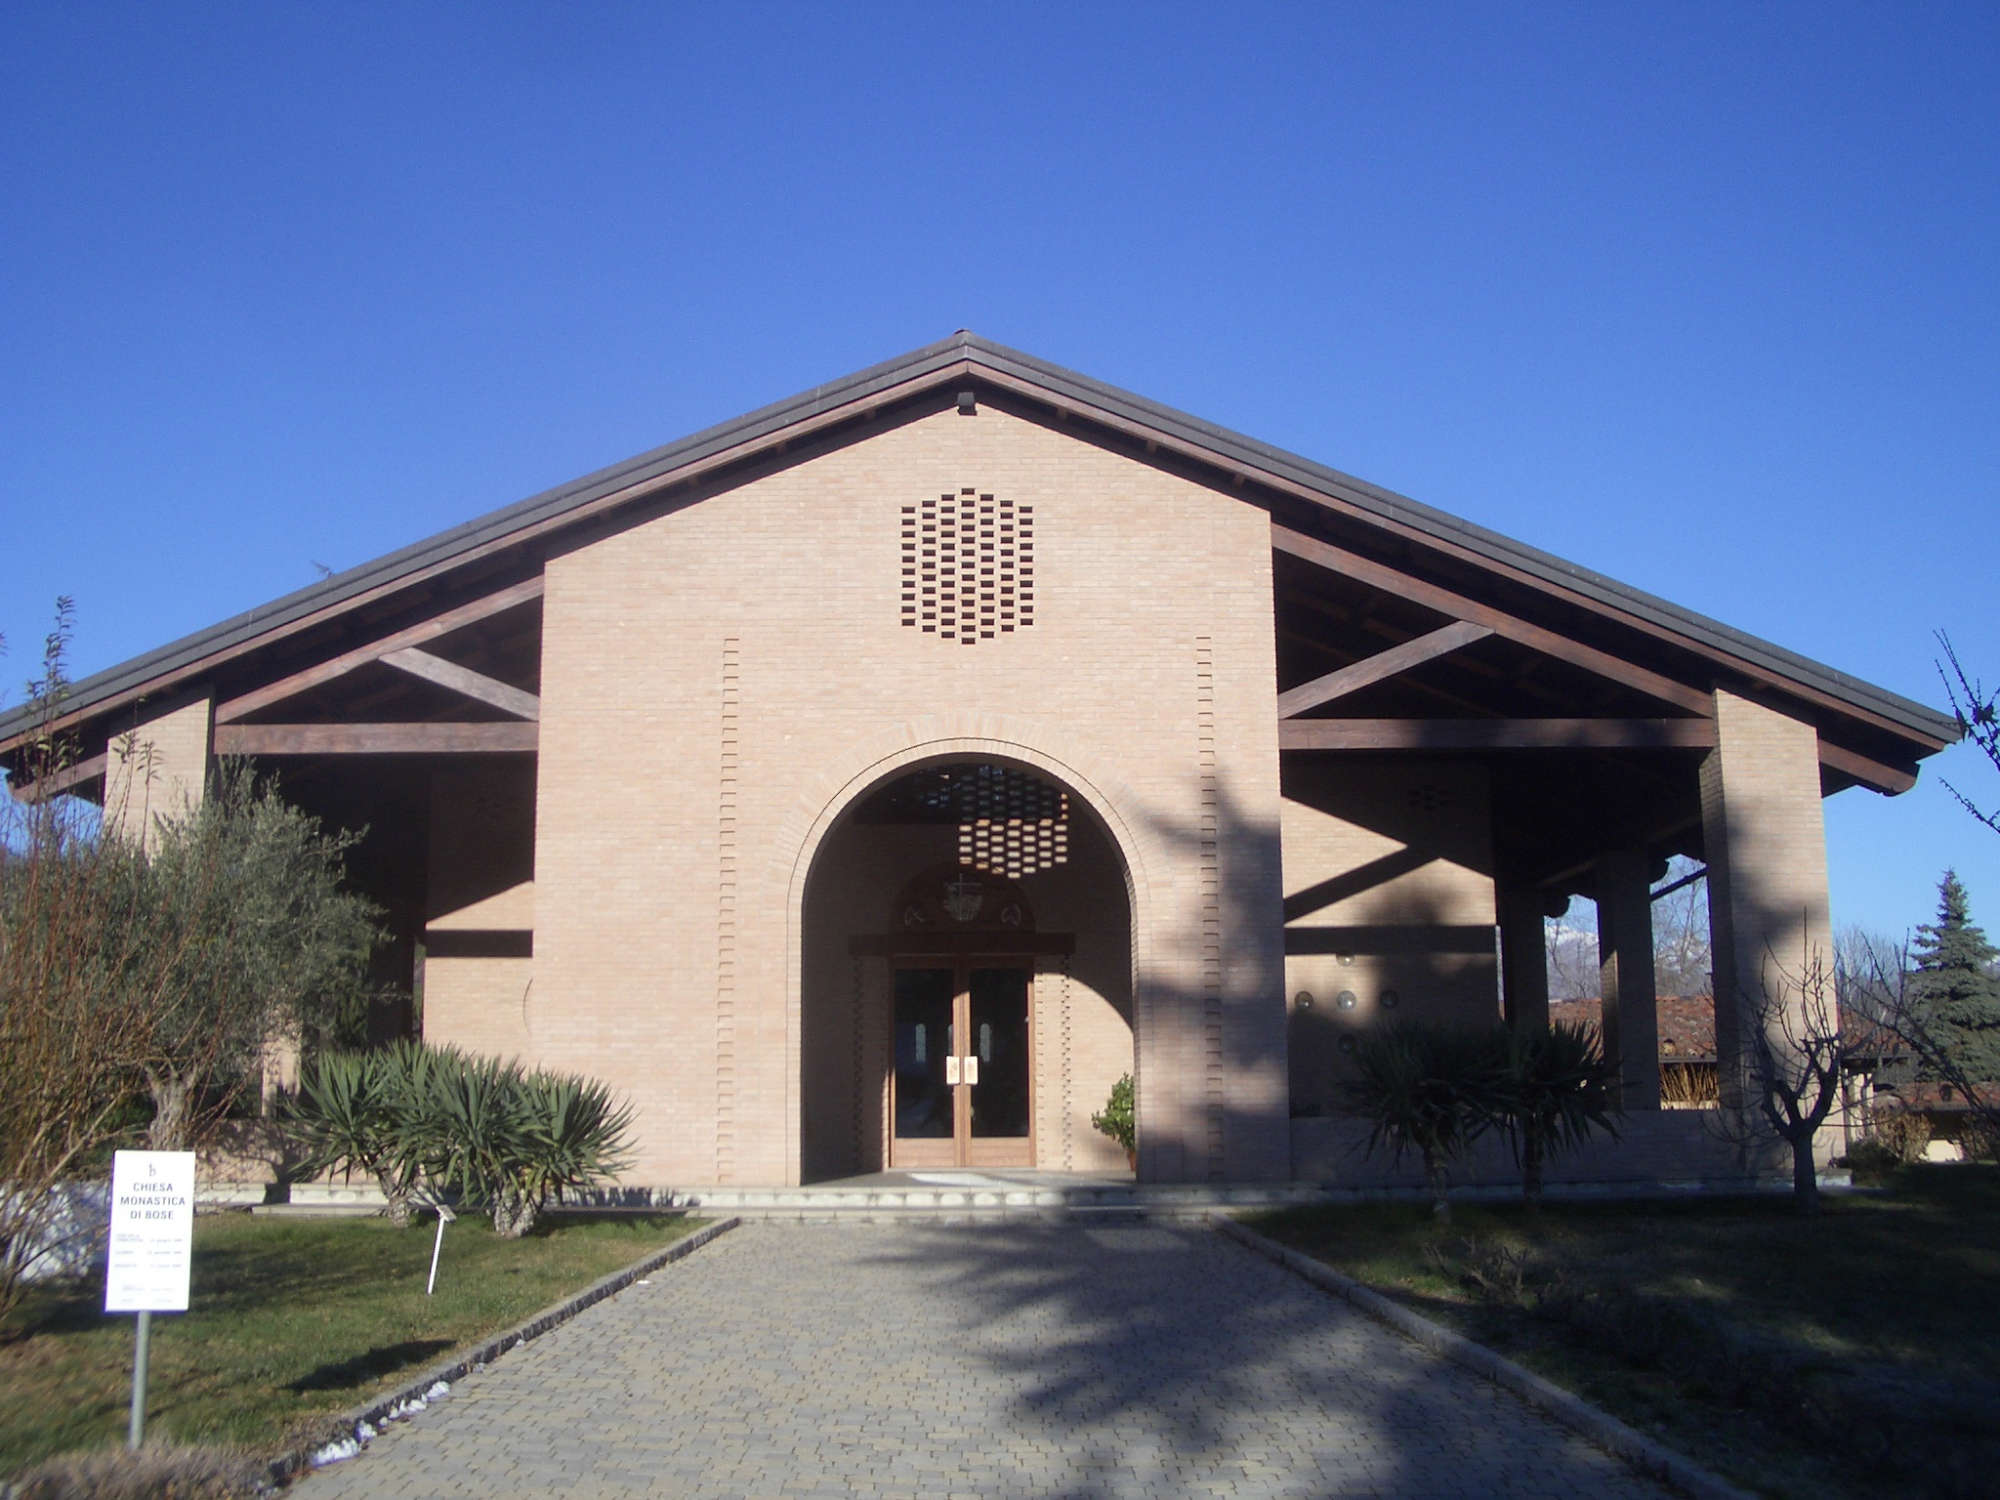 Chiesa Monastero Bose